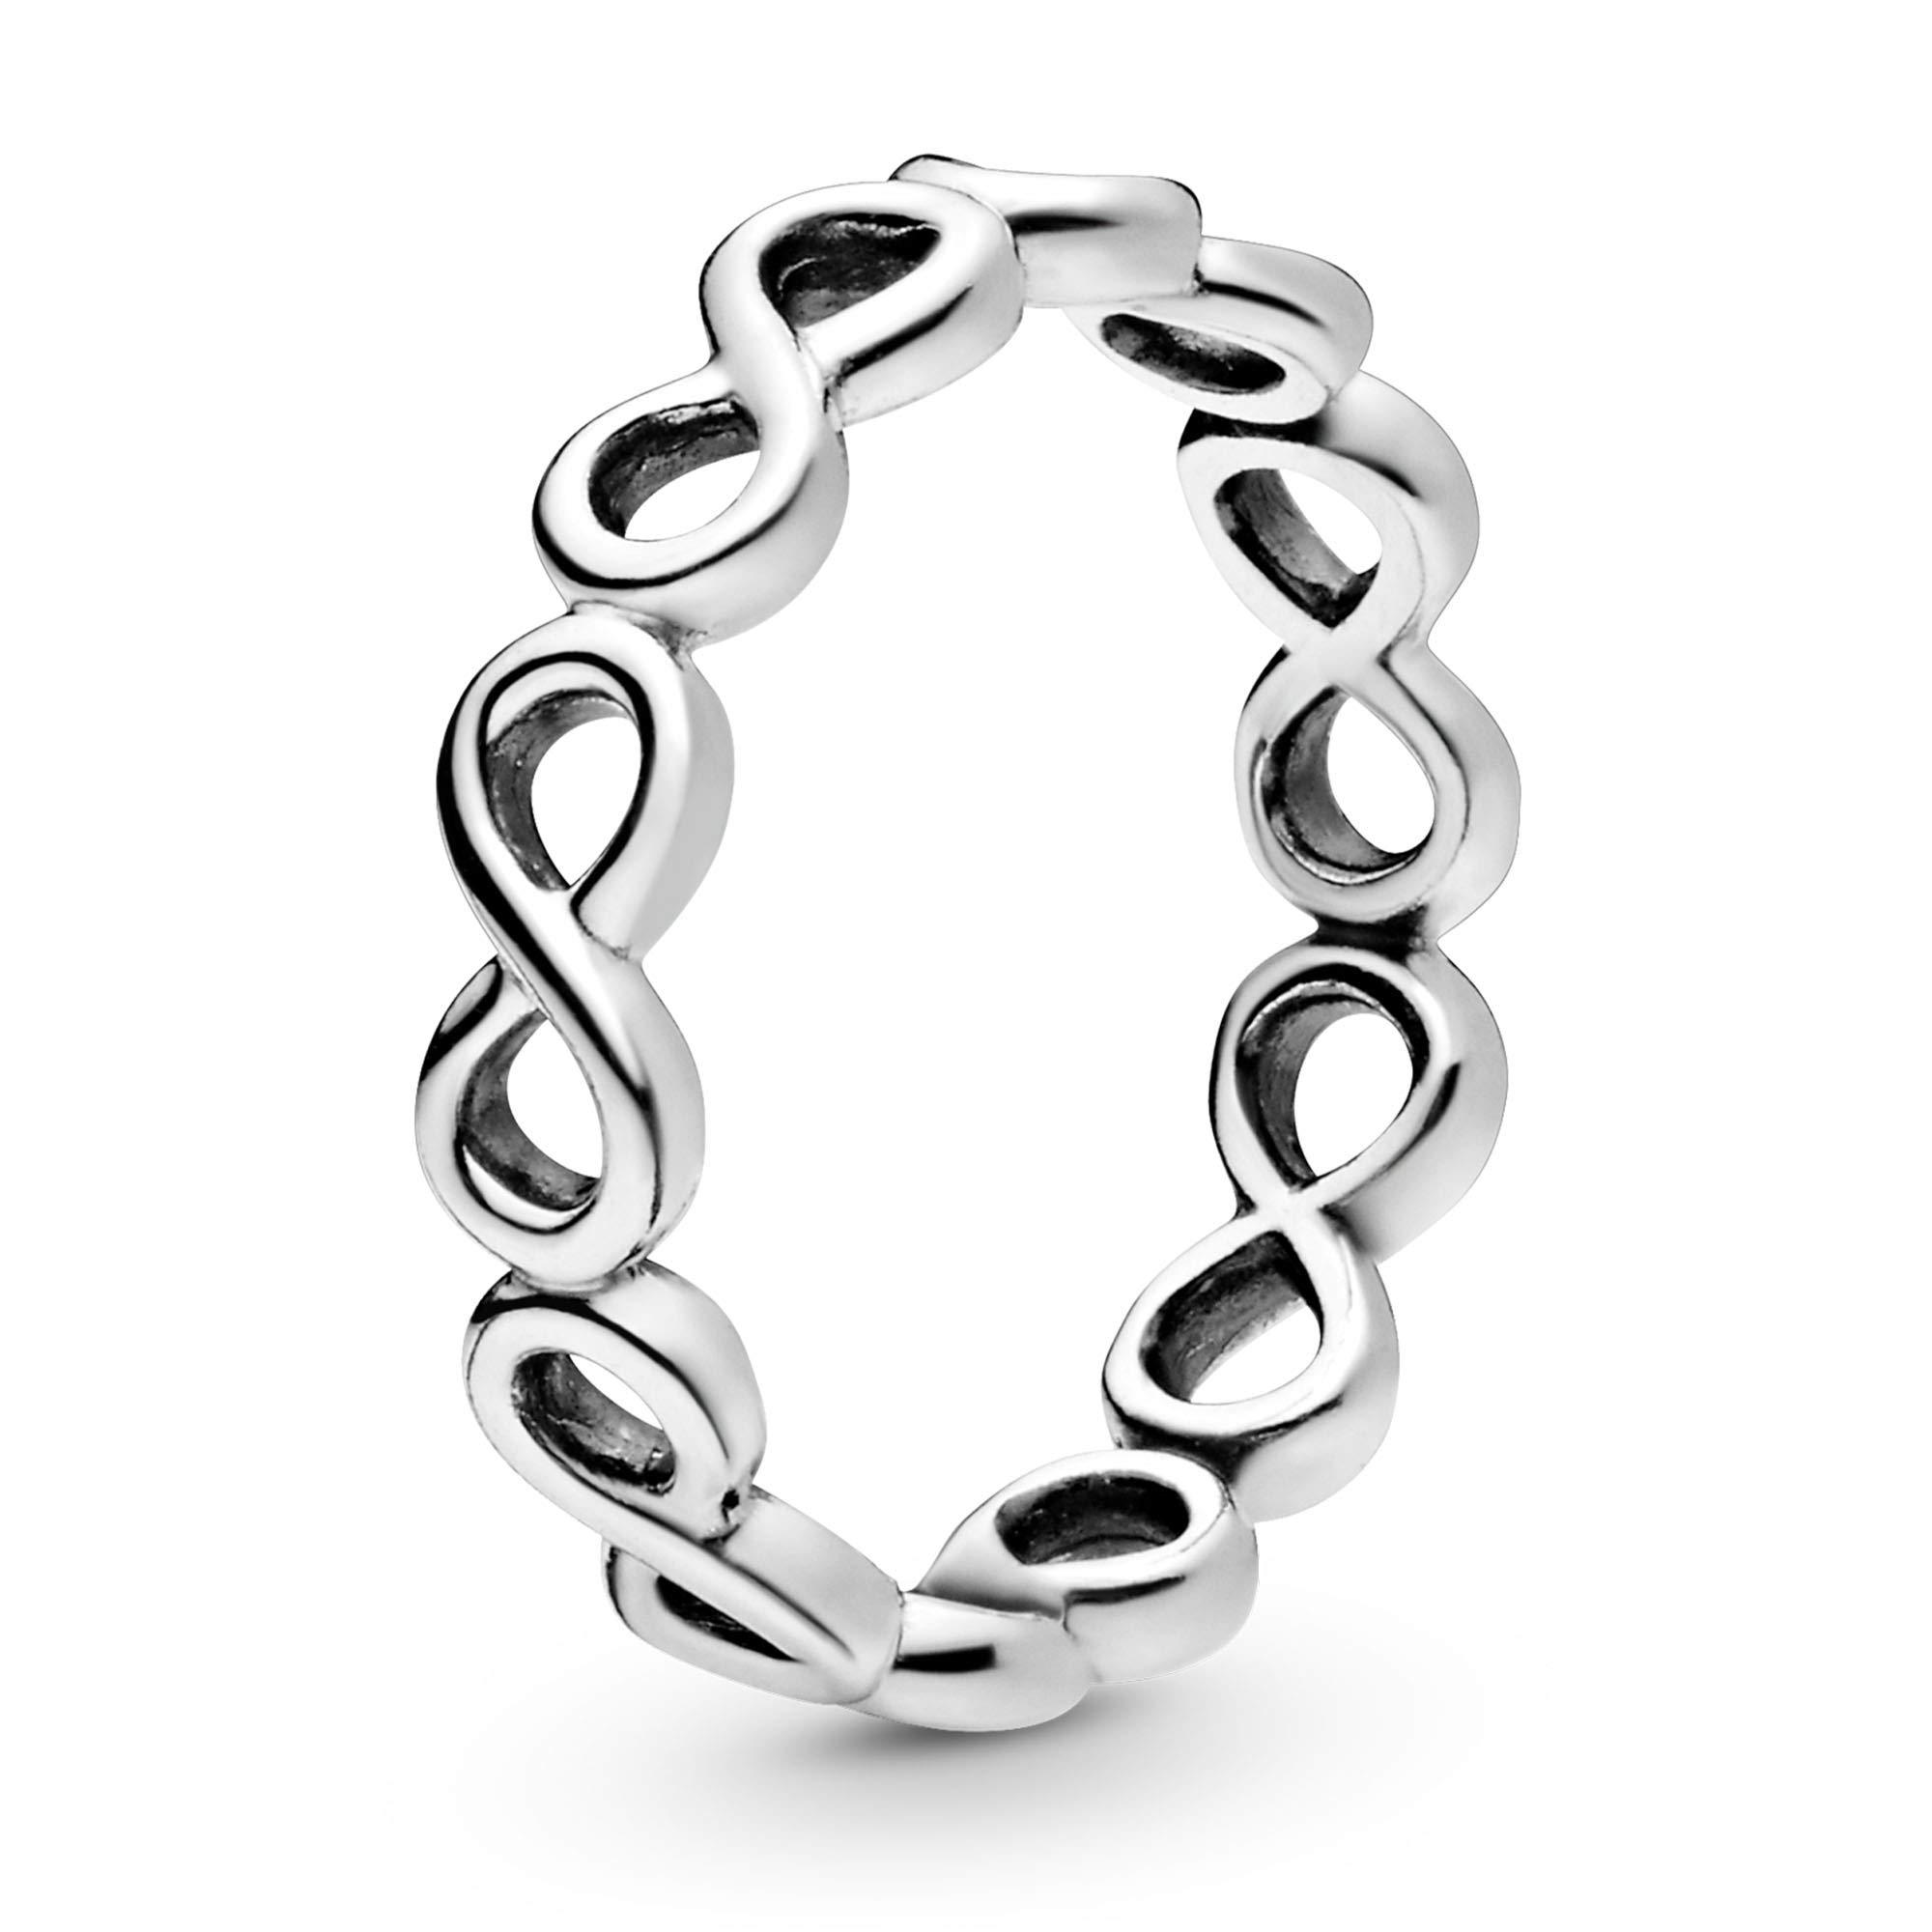 Pandora 190994 Women's Infinity Ring